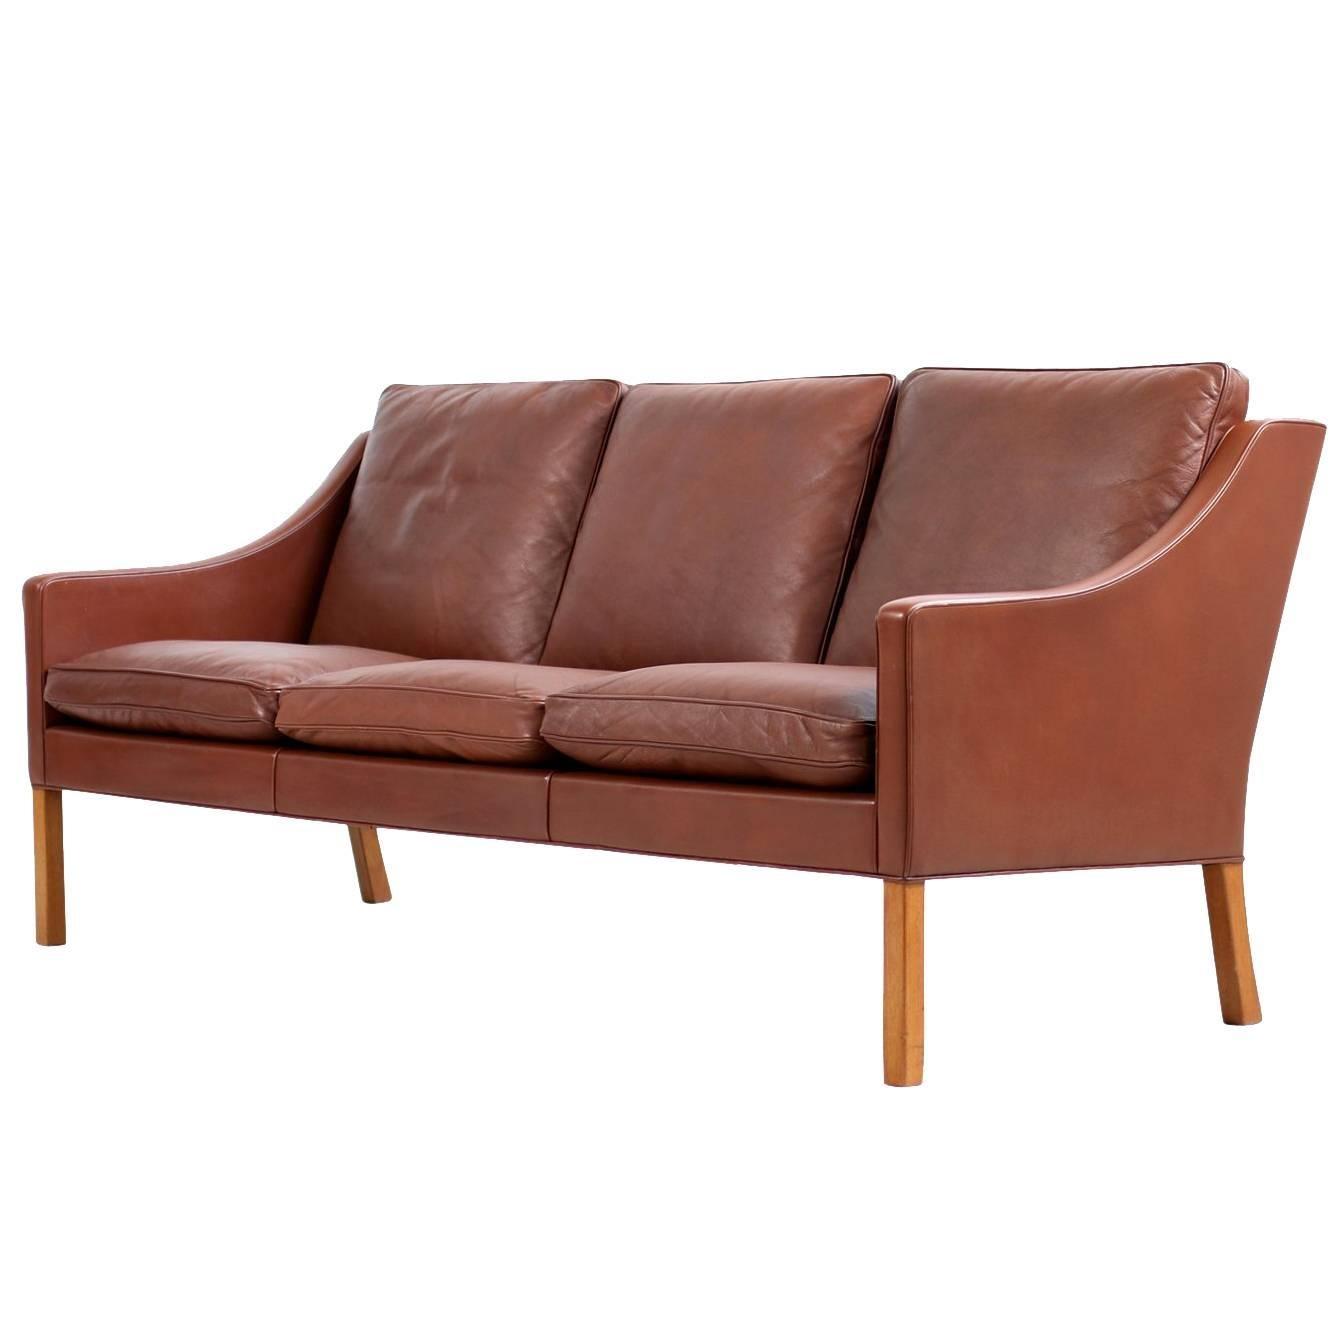 1960s Borge Mogensen Mod. 2209 Cognac Leather Lounge Sofa Fredericia, Denmark